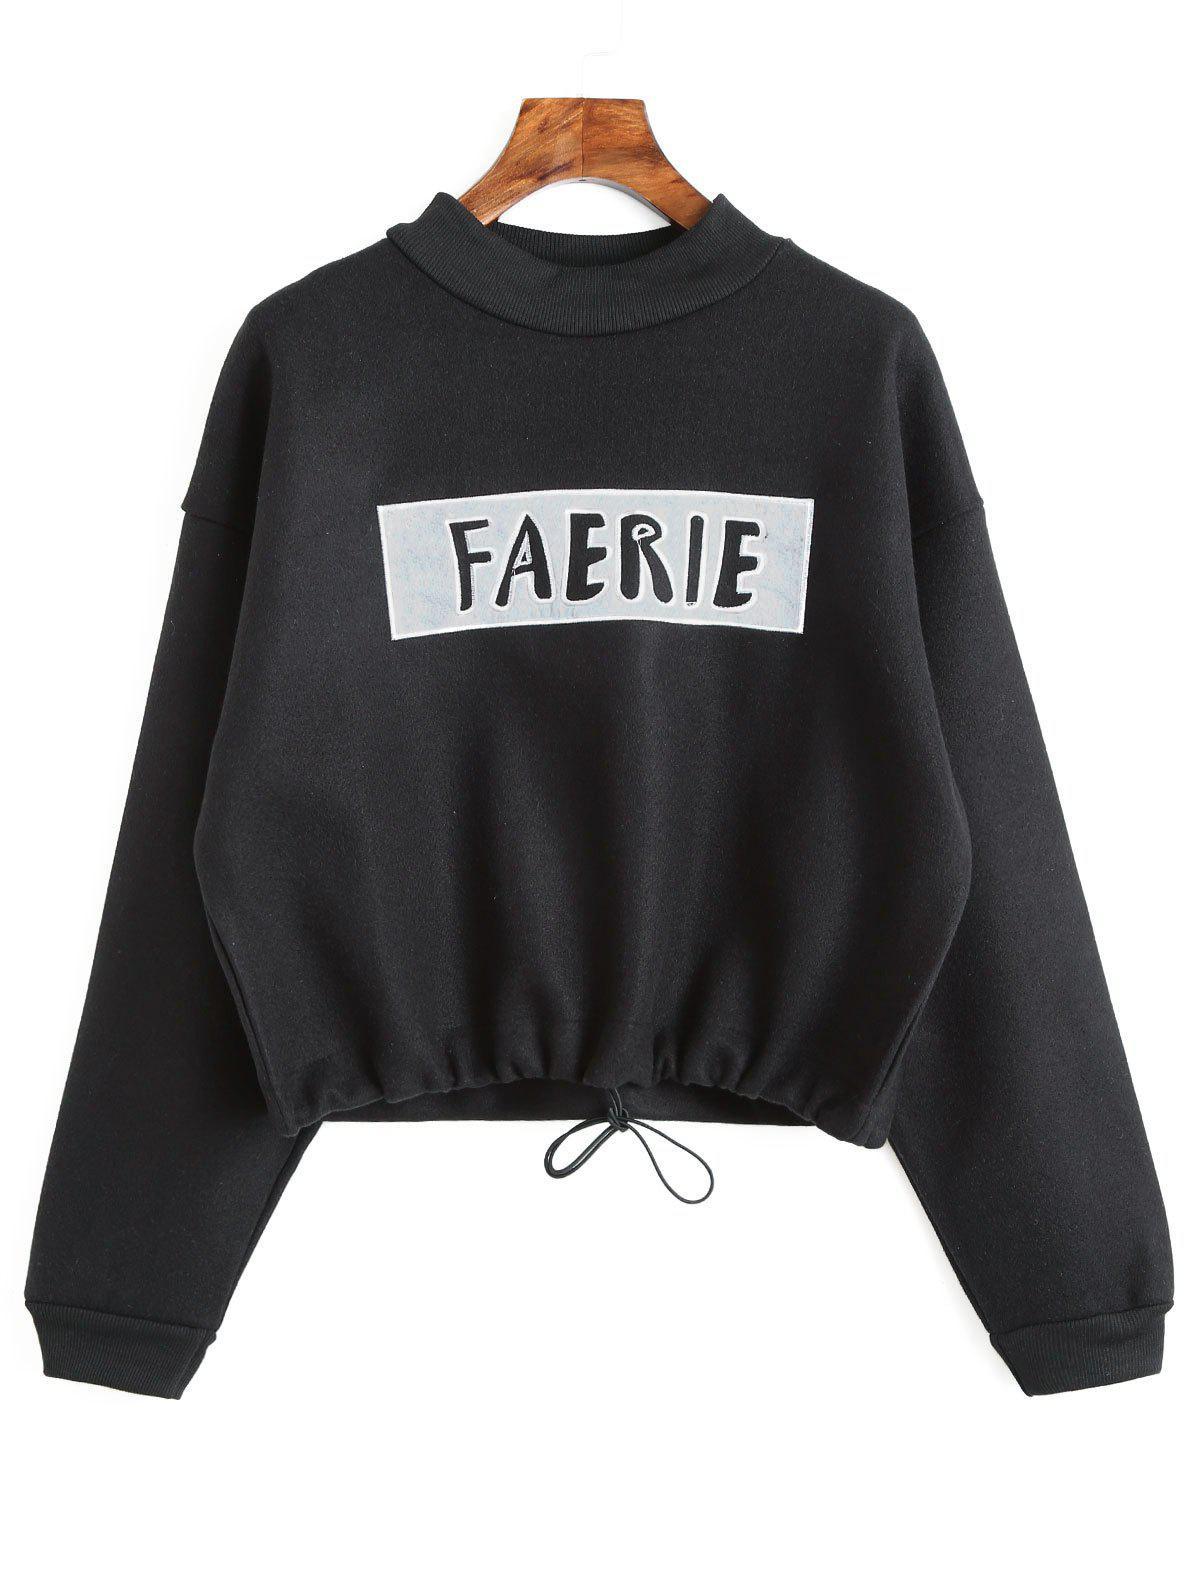 Image of Drawstring Hem Graphic Faerie Sweatshirt